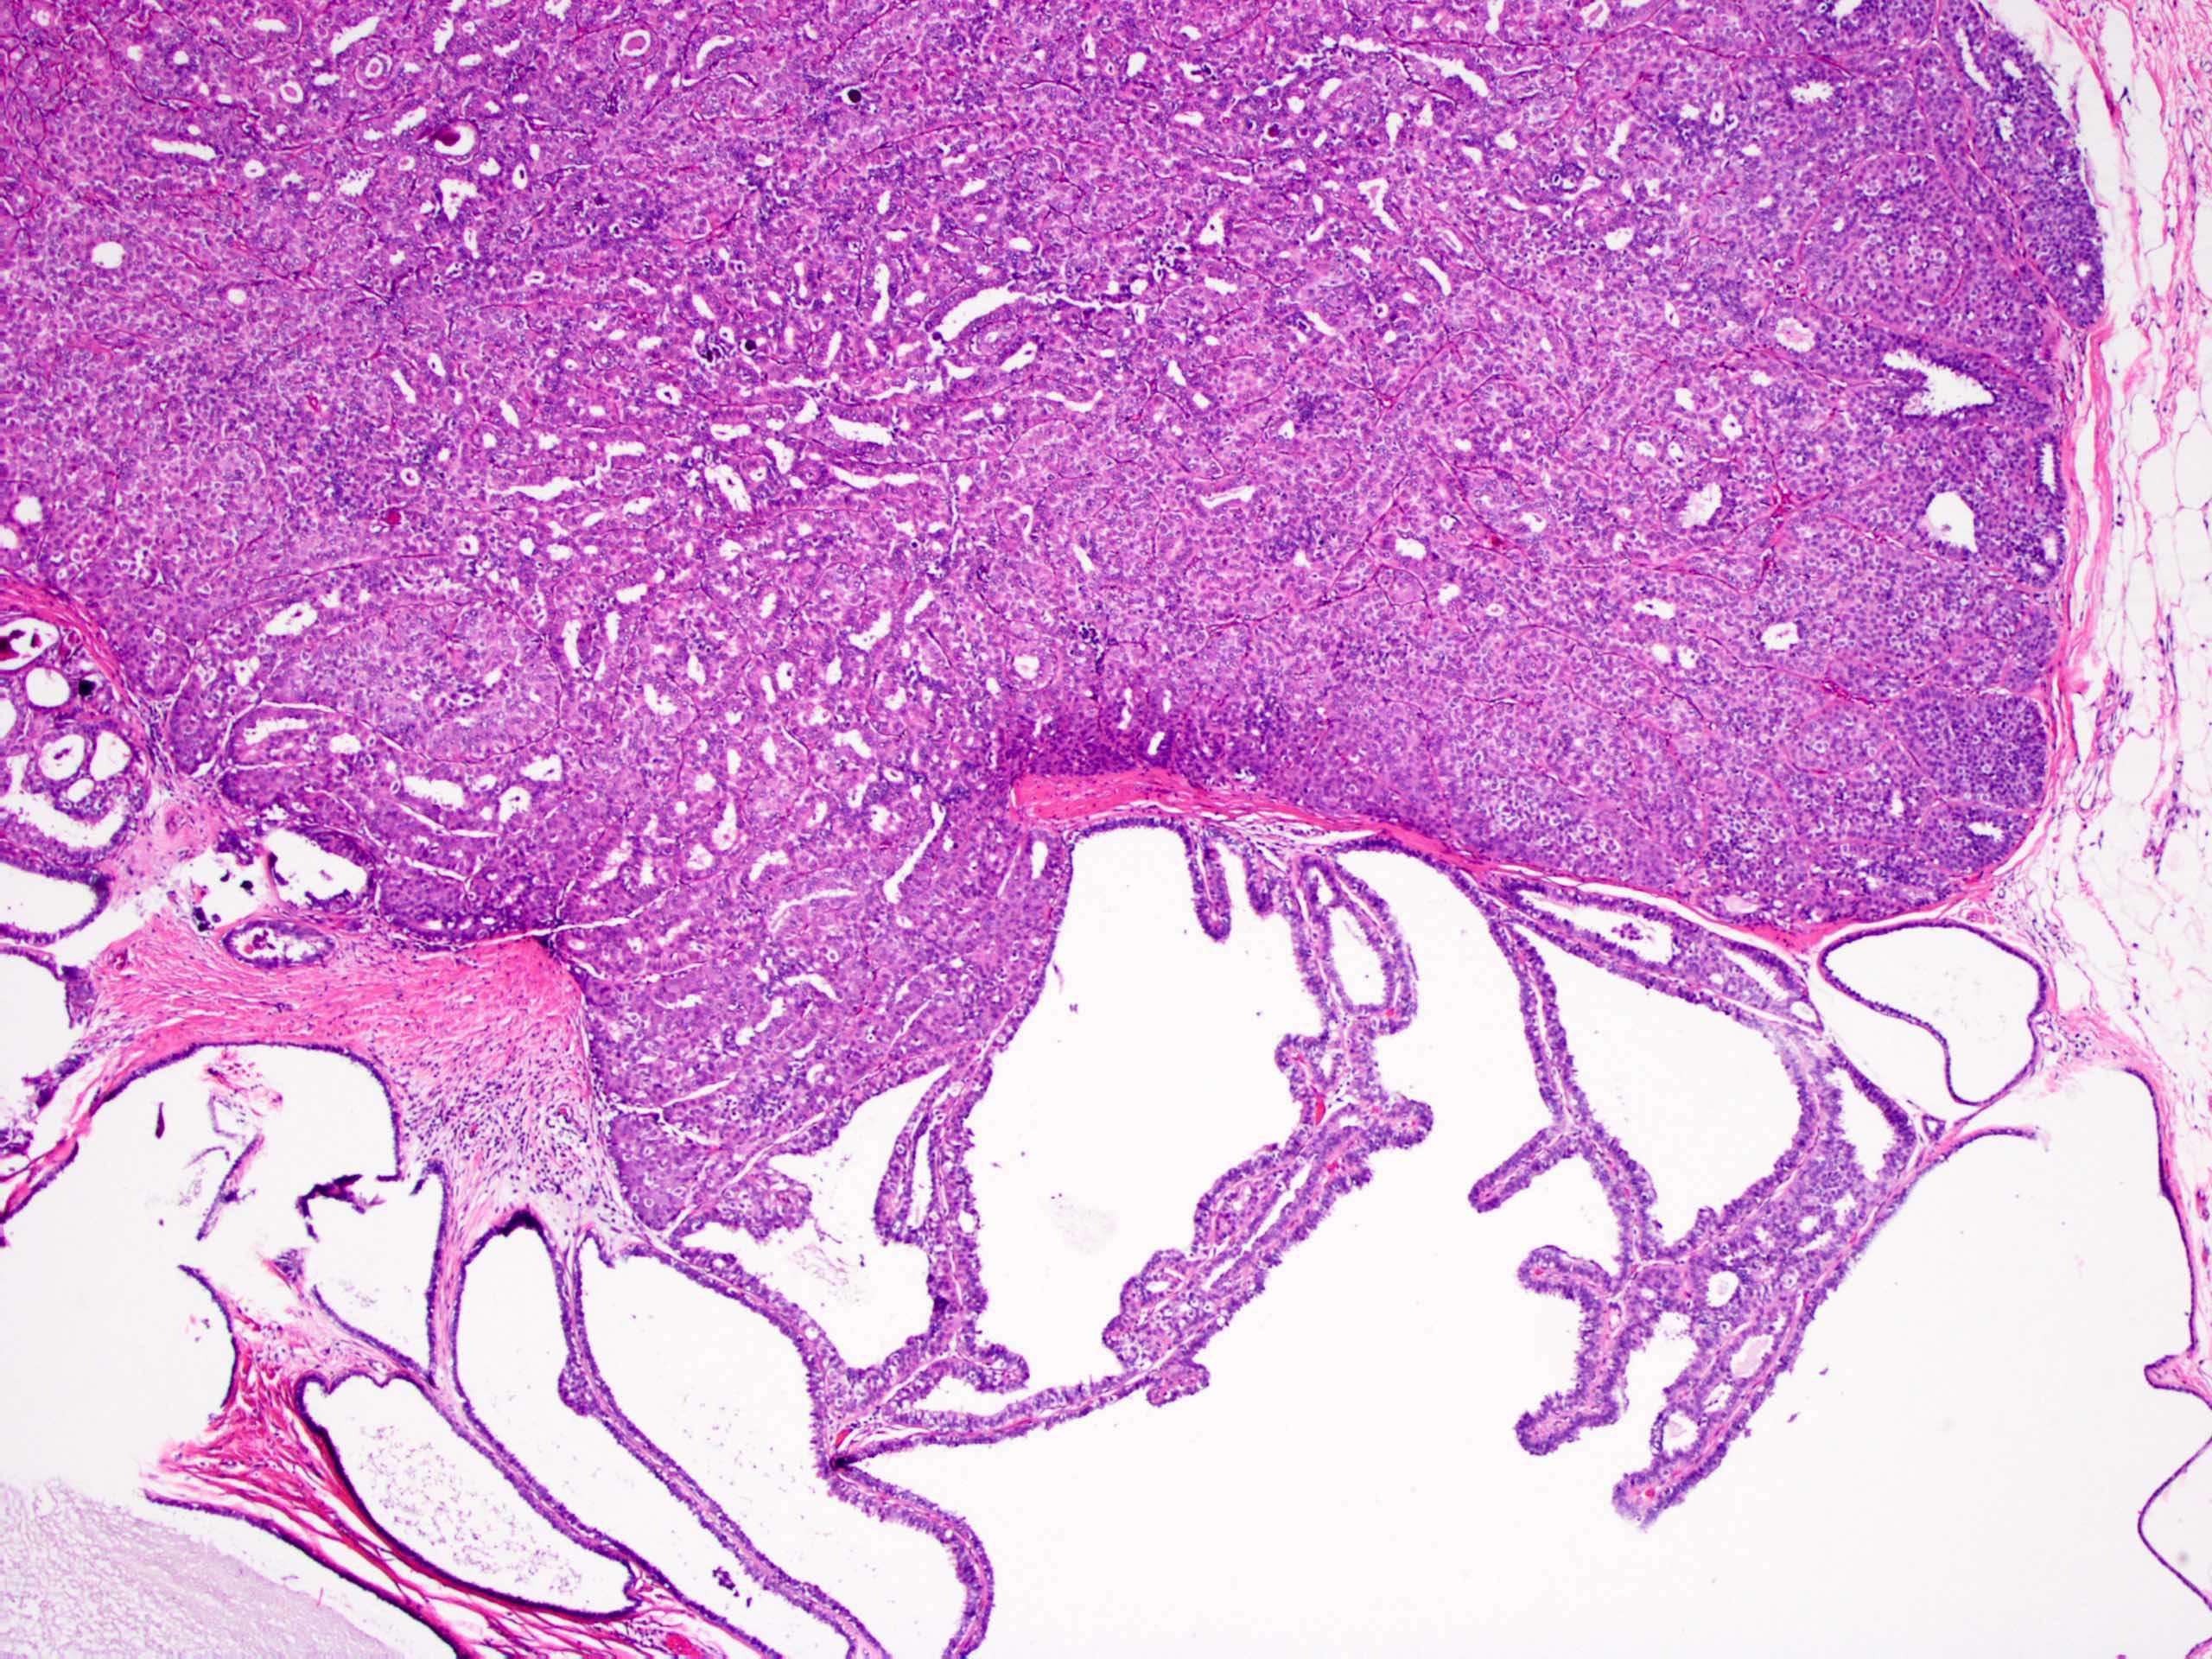 Emlő daganatok | Hungarian Oncology Network - gal-kuria.hu